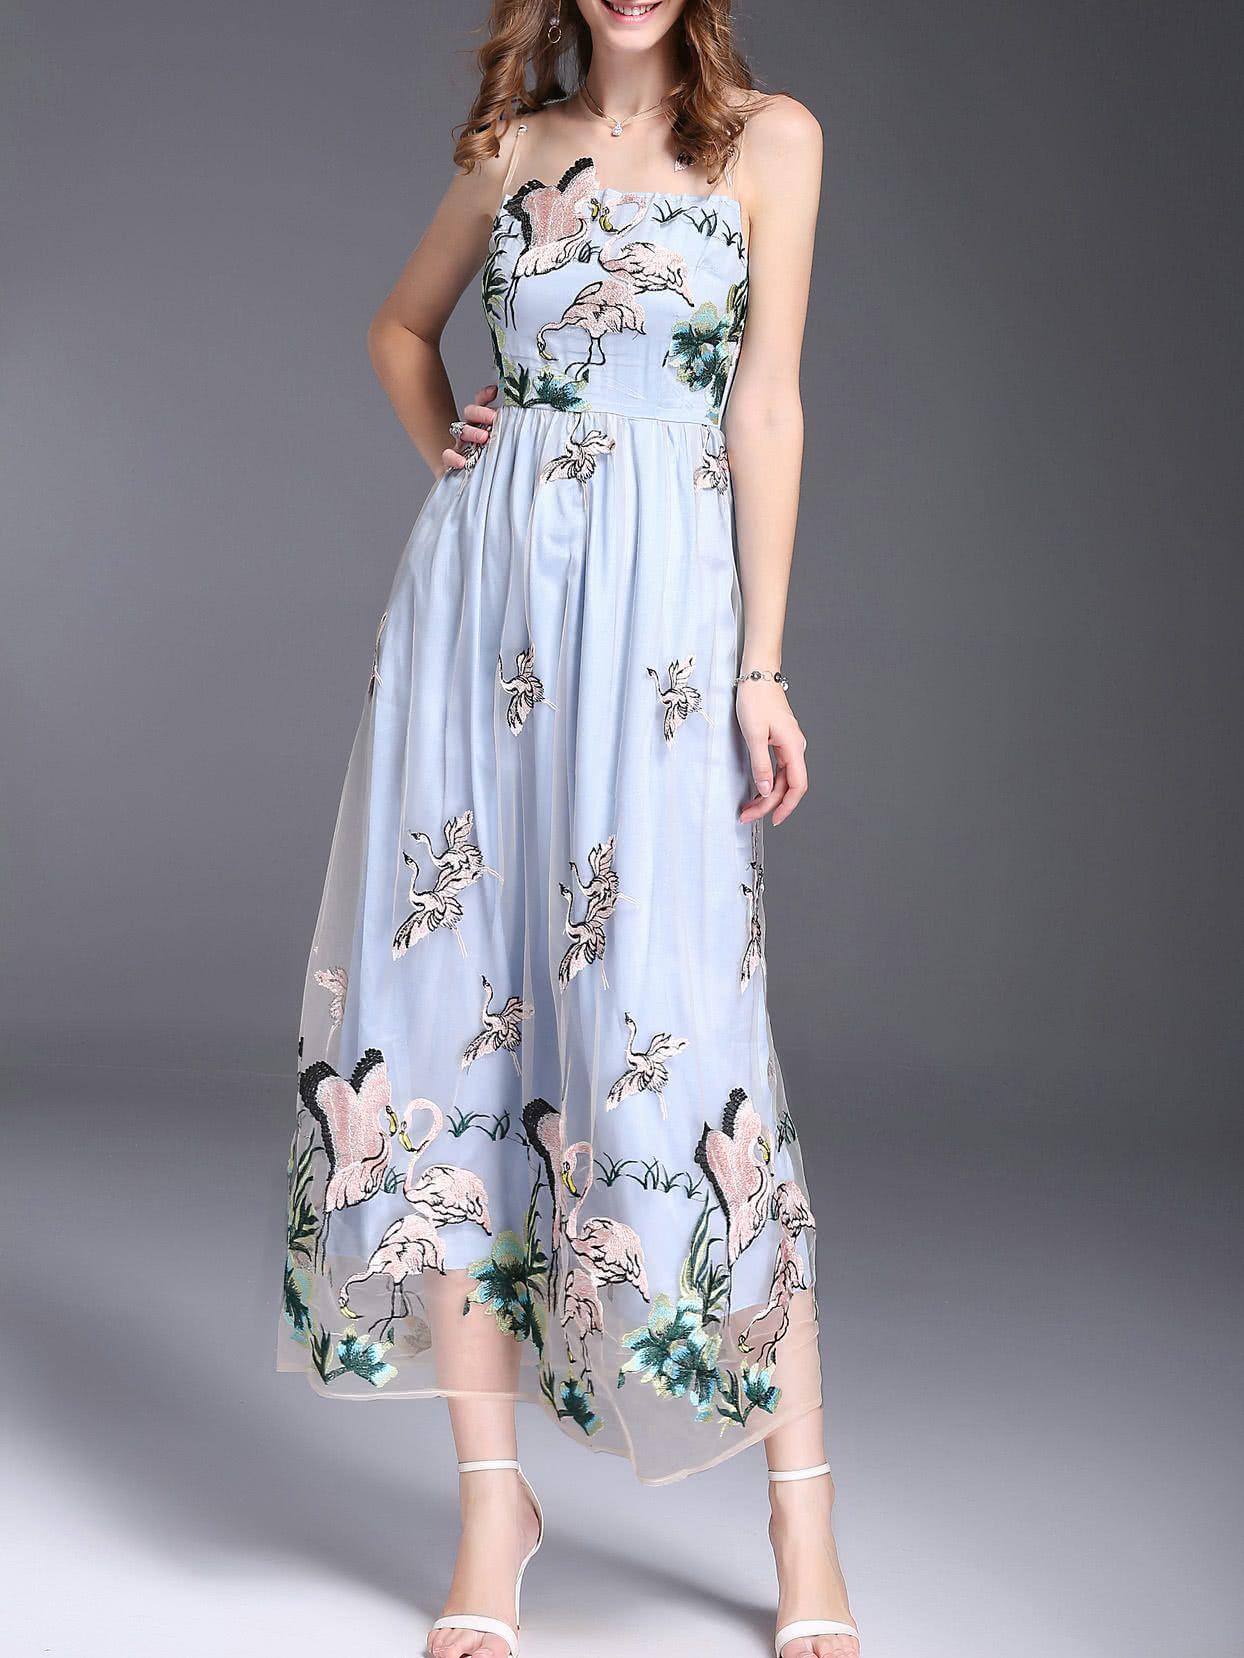 0c7f686bc6 Crane Gauze Embroidered Dress -SheIn(Sheinside)   Shein Boutique in ...